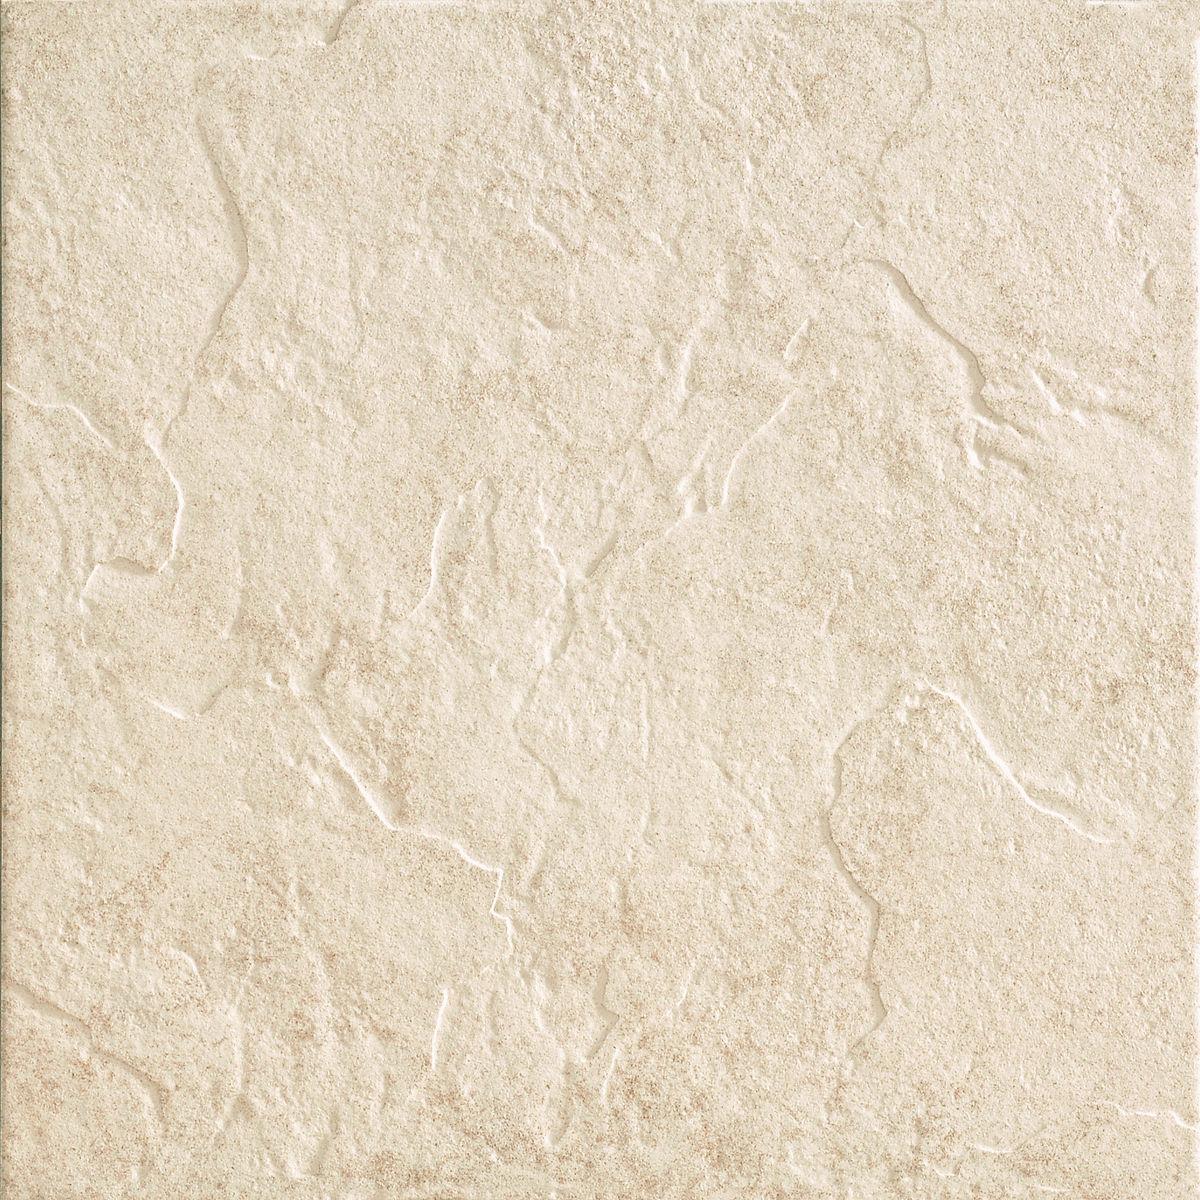 Керамогранит Zeus Ceramica Casa Geo Avorio 45х45 Cp8018181p